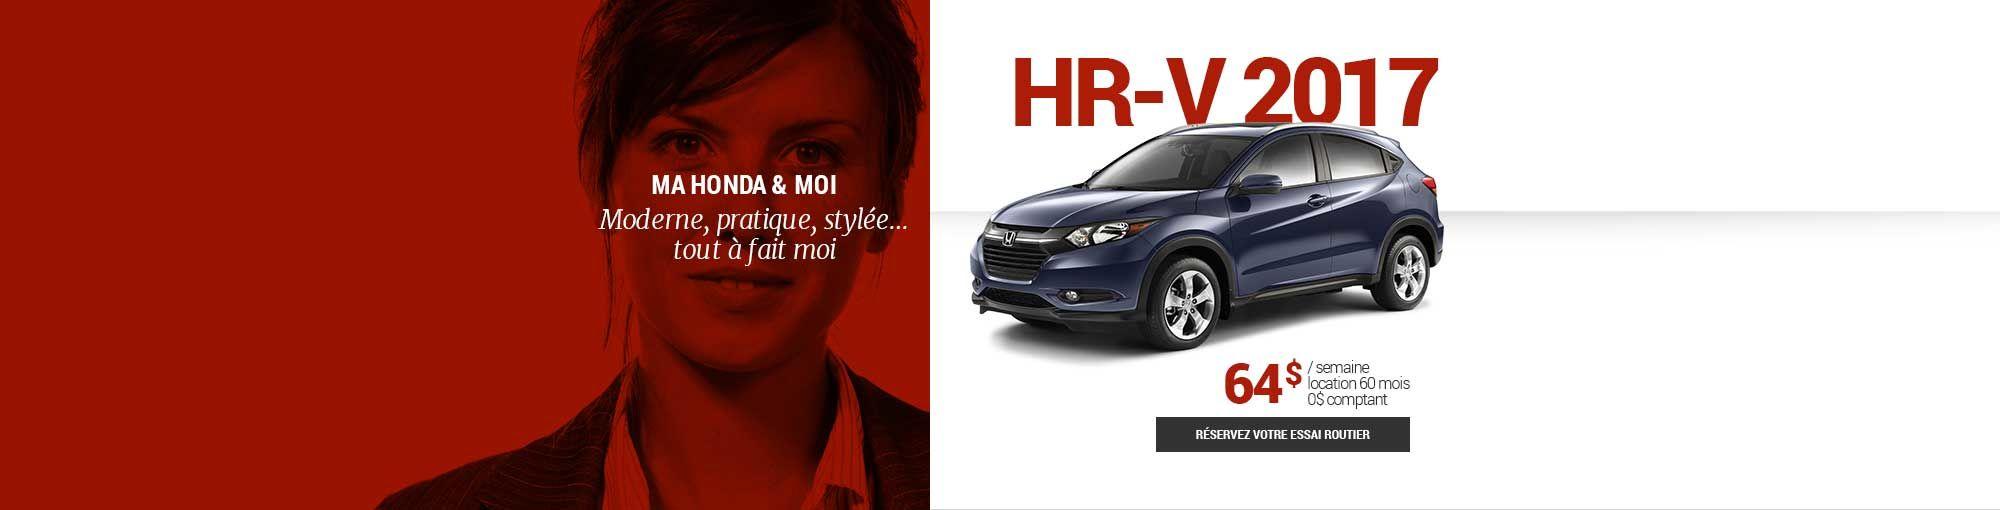 HR-V 2017 - mai-juin-juillet